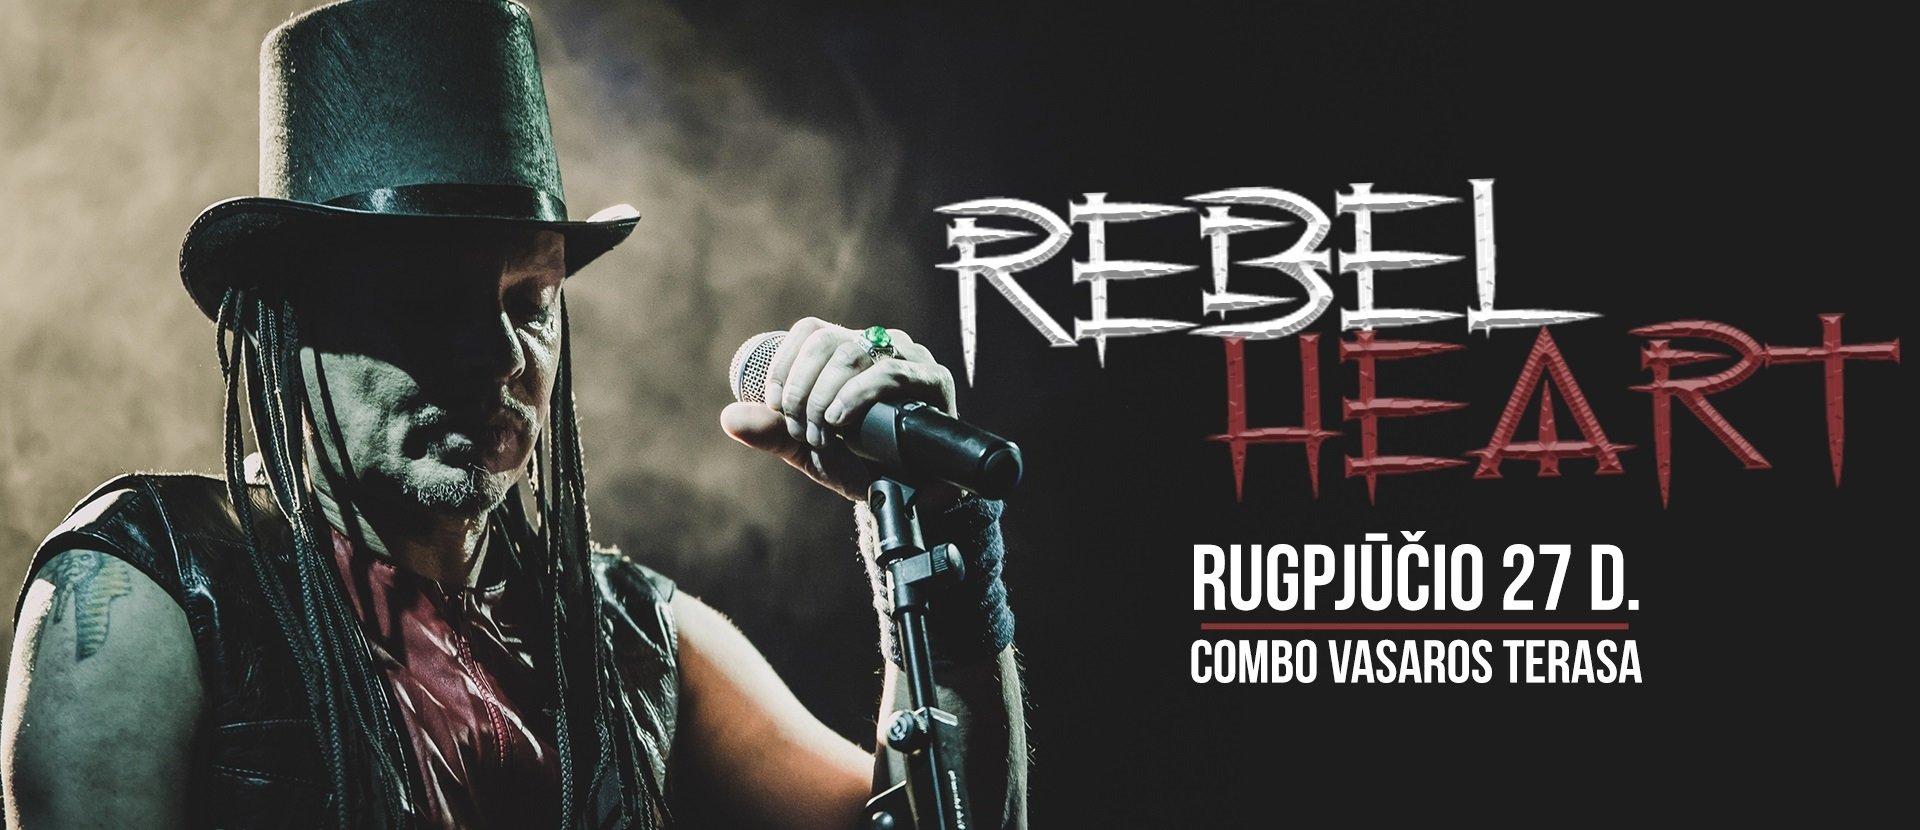 "Grupės ""Rebelheart"" koncertas!"